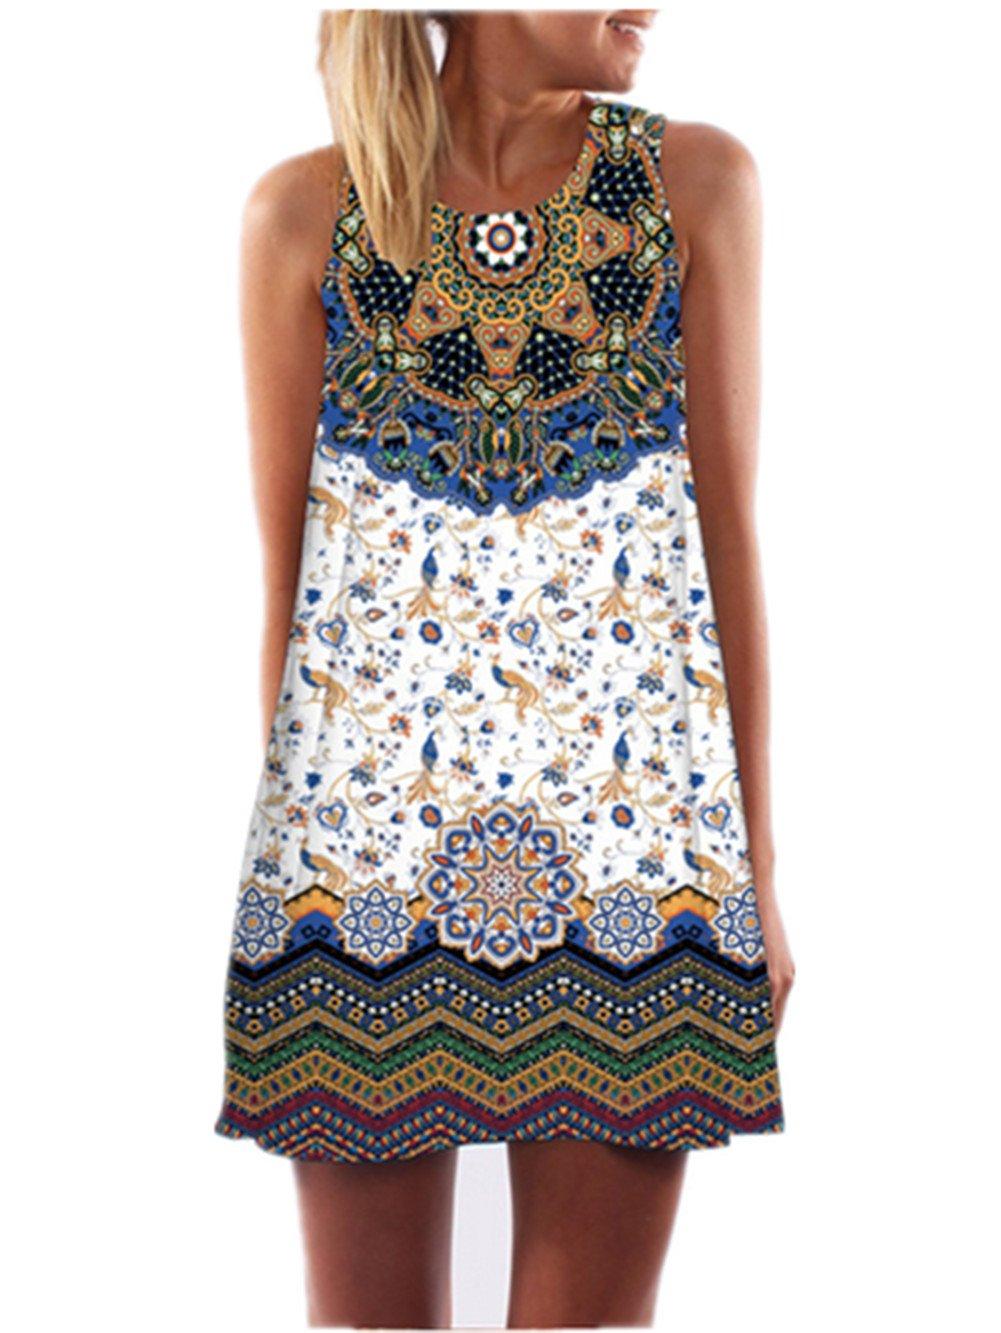 SRYSHKR Clearance 2018 Women's Summer Sleeveless Damask Floral Print Casual Loose T-Shirt Dress (Black, XXL)